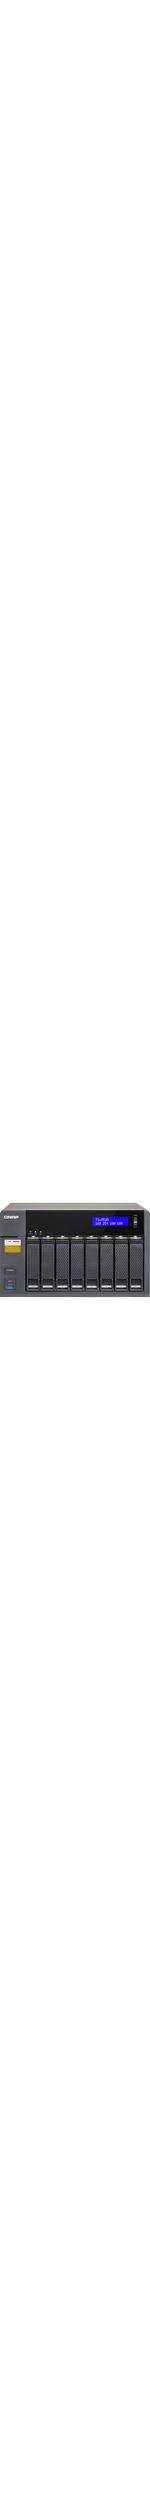 QNAP Turbo NAS TS-853A 8 x Total Bays NAS Server - Desktop - Intel Celeron N3150 Quad-core 4 Core 1.60 GHz - 8 GB RAM DDR3L SDRAM - Serial ATA/600 - RAID Supported